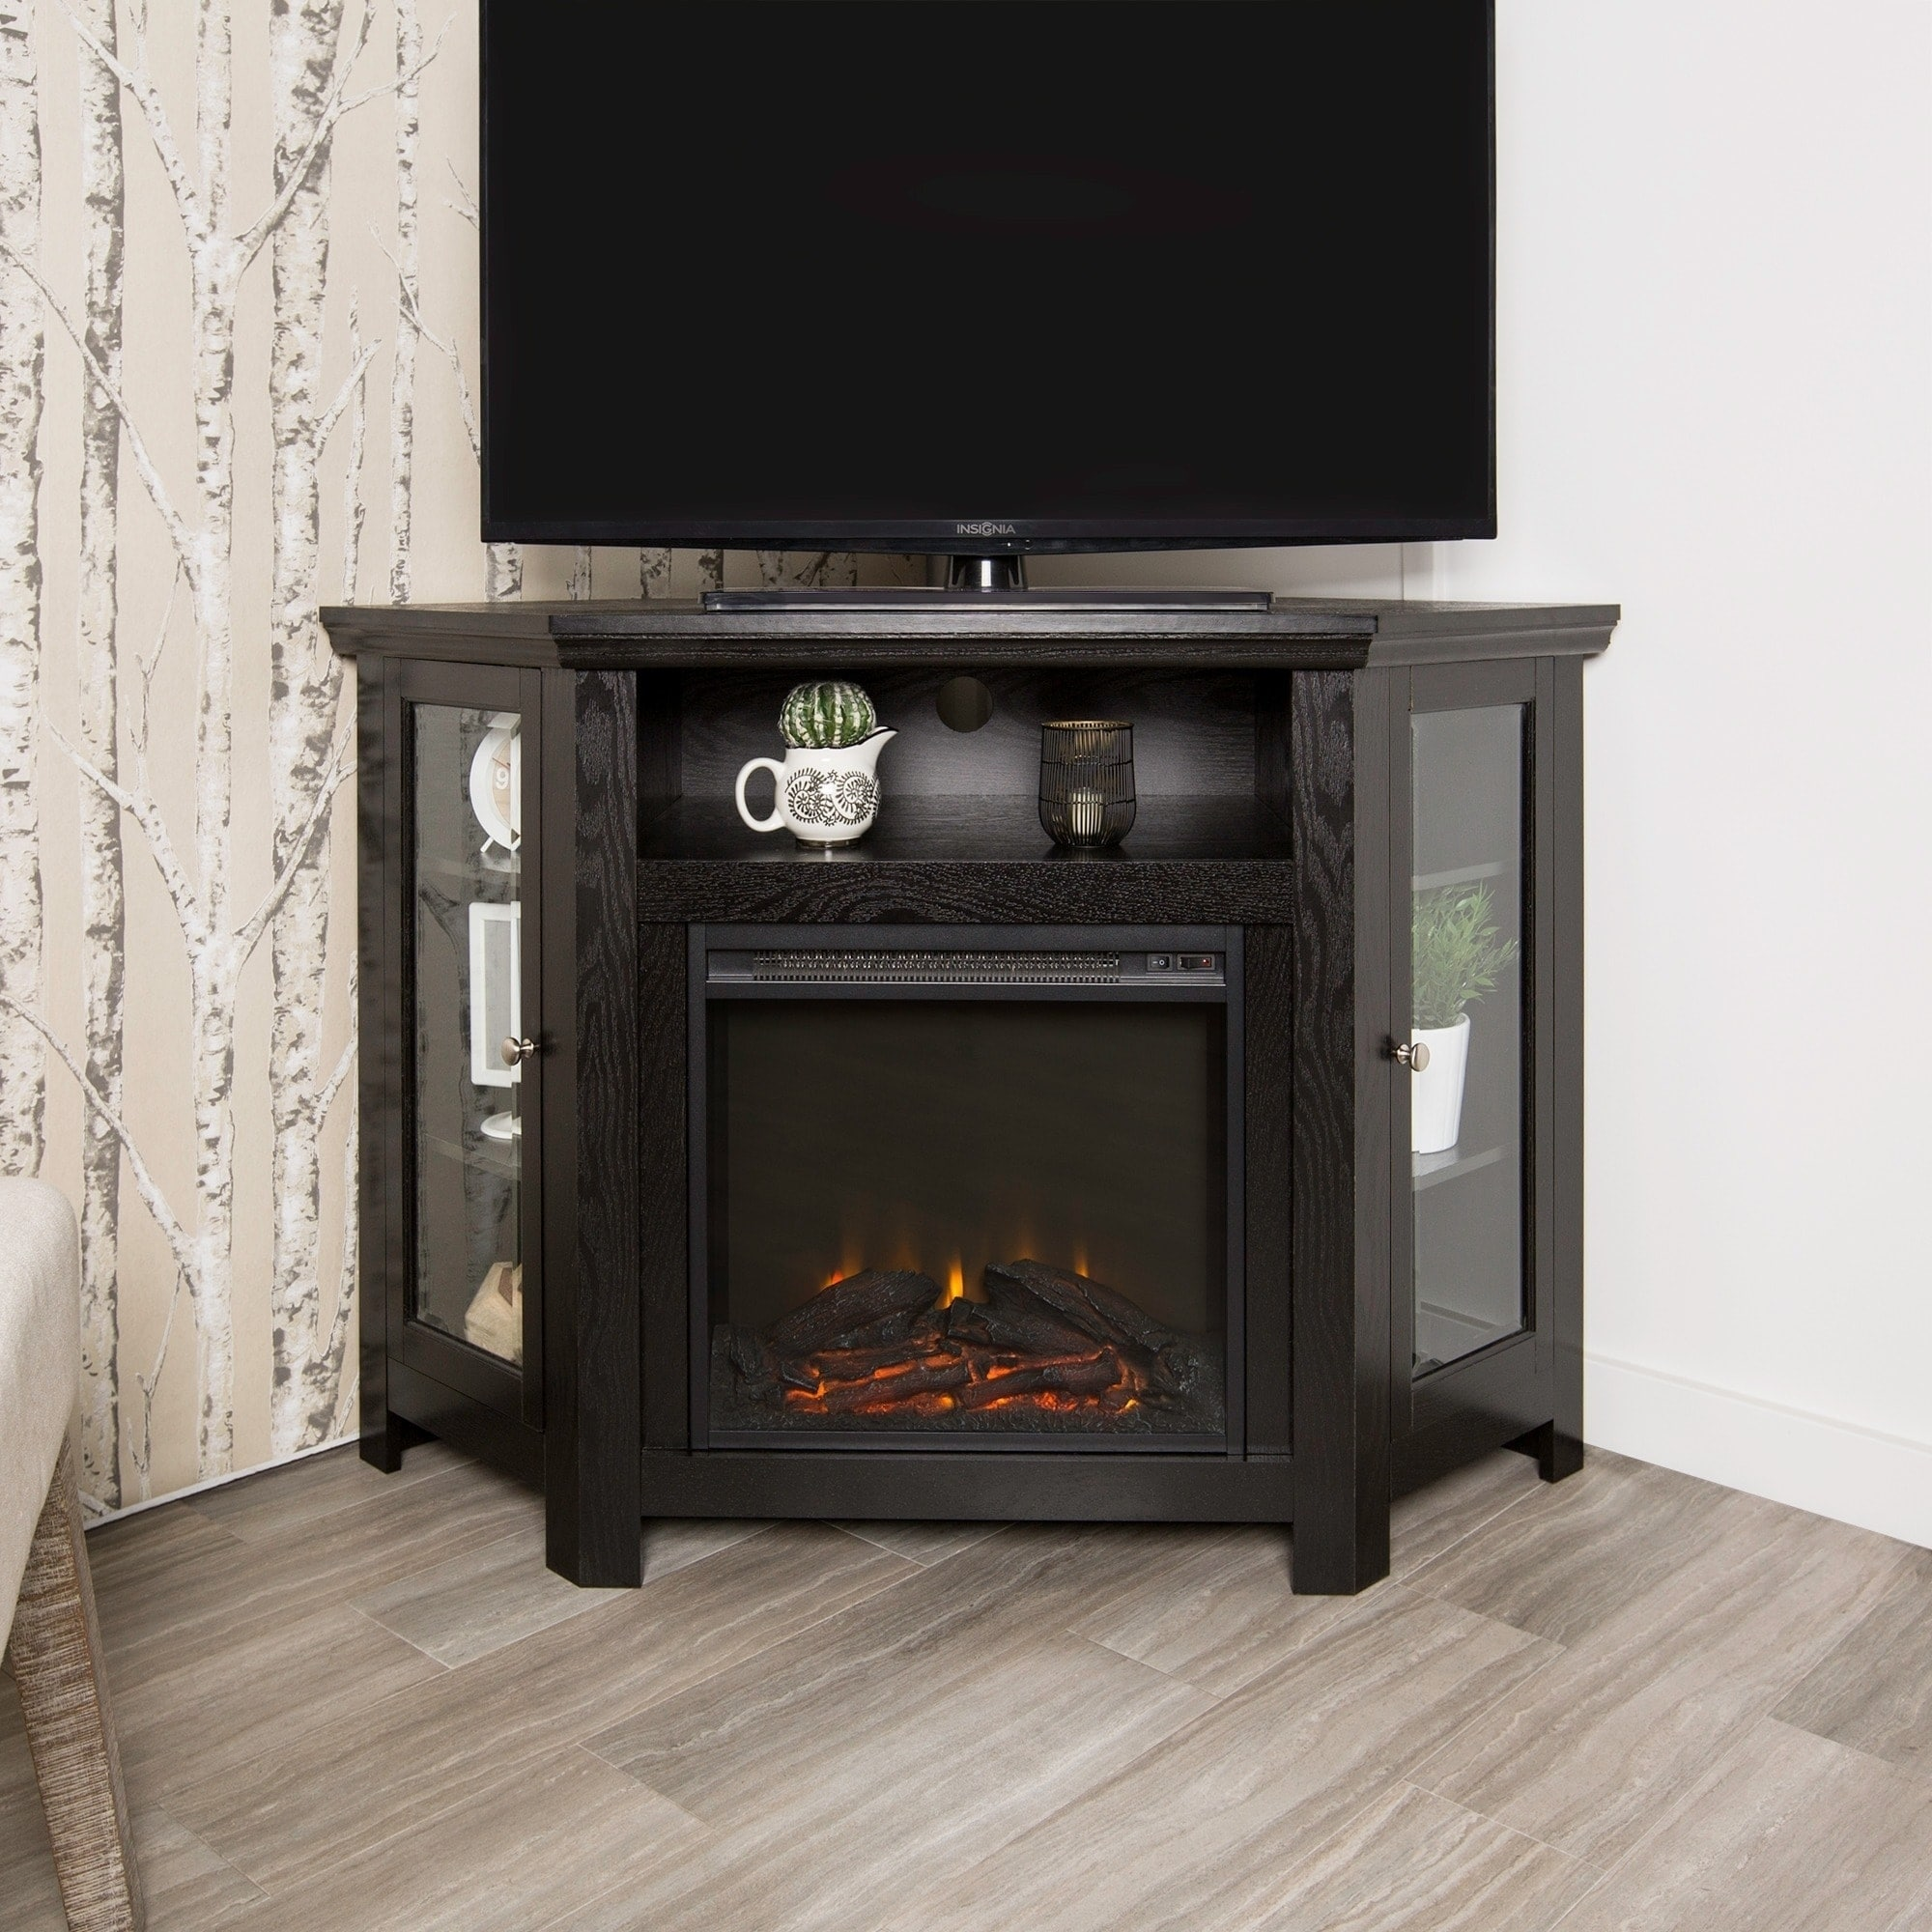 48 Inch Black Corner Fireplace Tv Stand Console Black 48 X 20 X